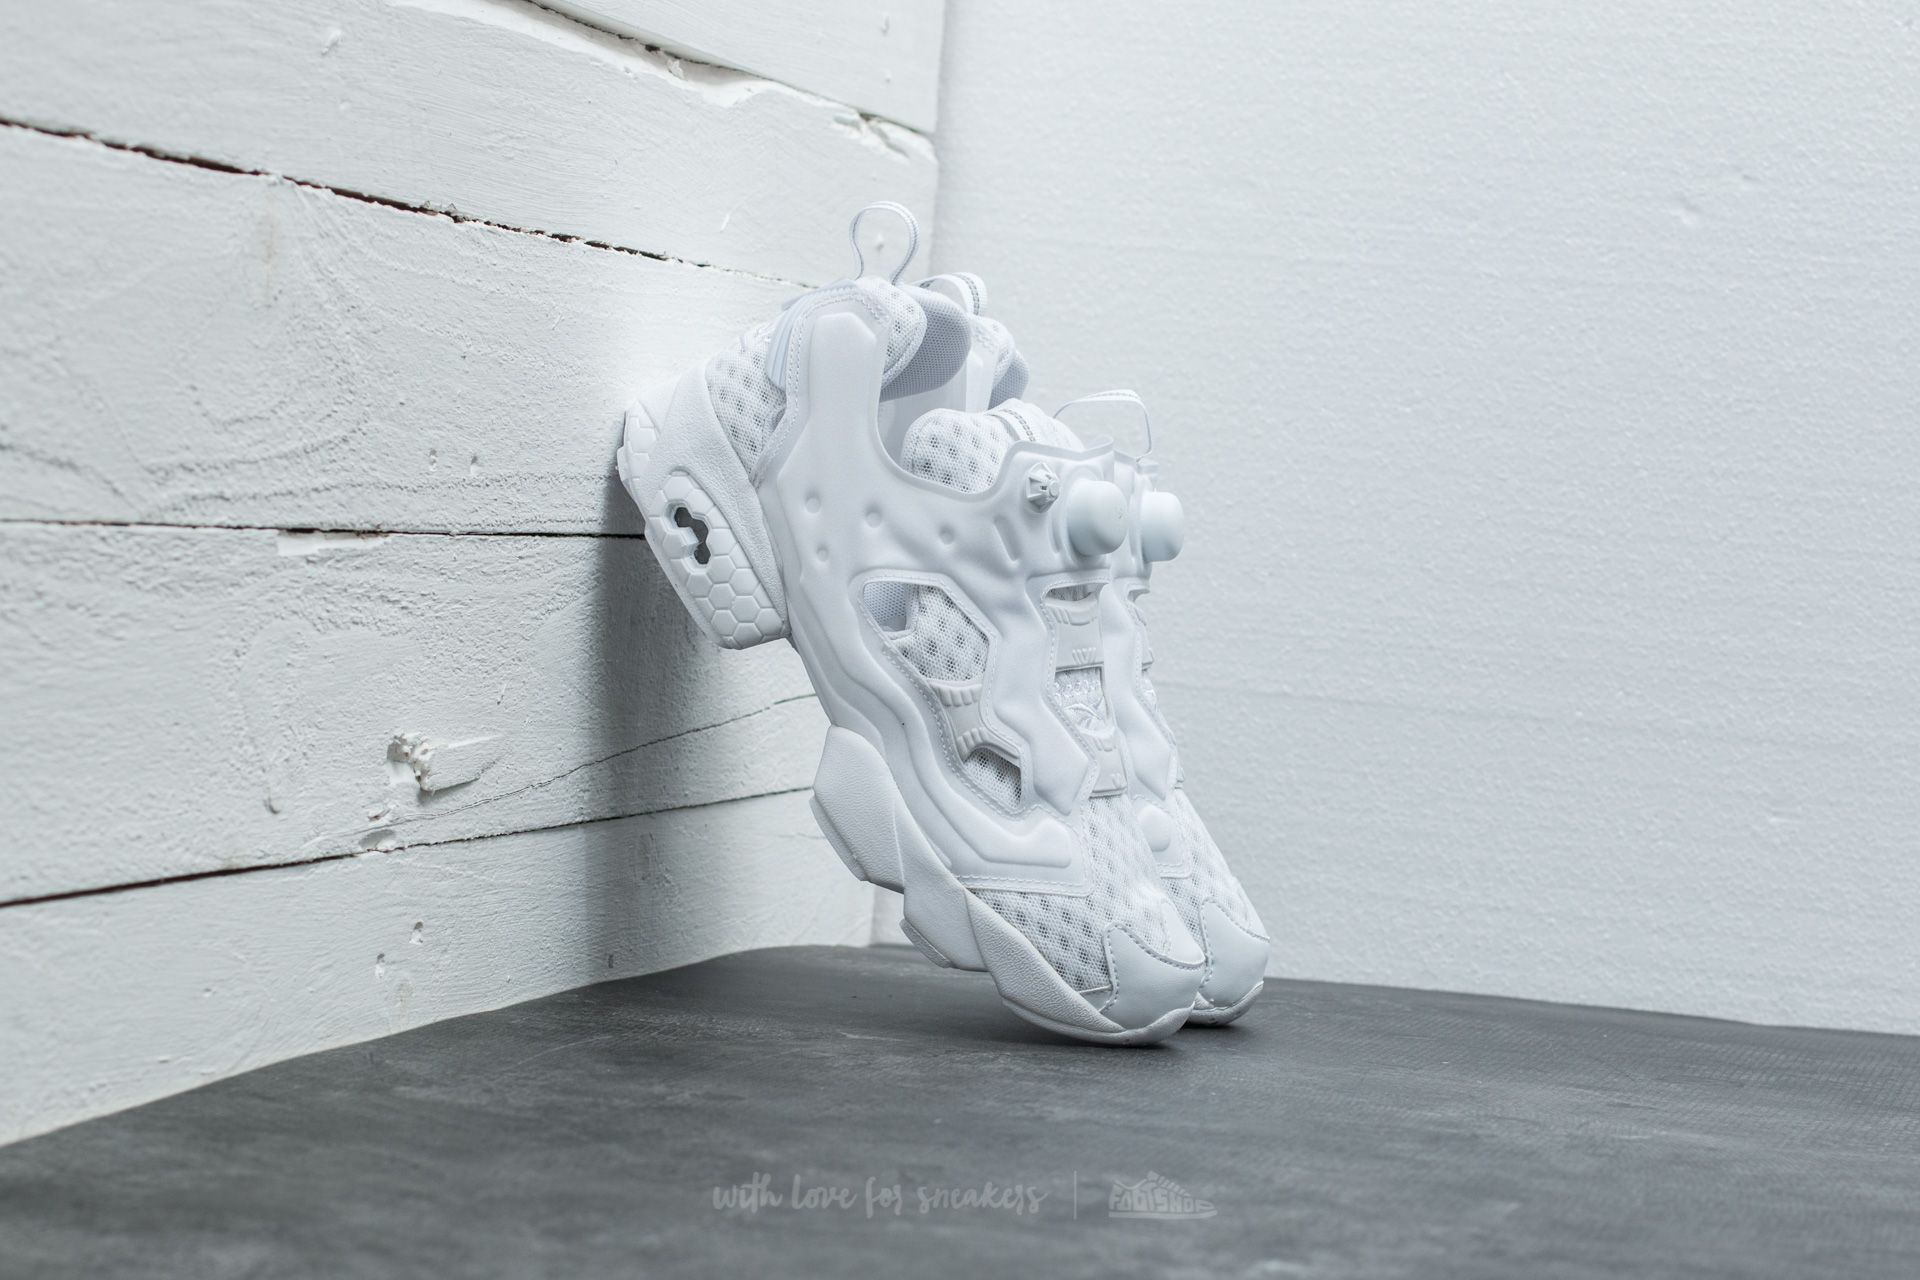 d0d6c529ba8 Reebok Instapump Fury OG CC White/ Steel | Footshop